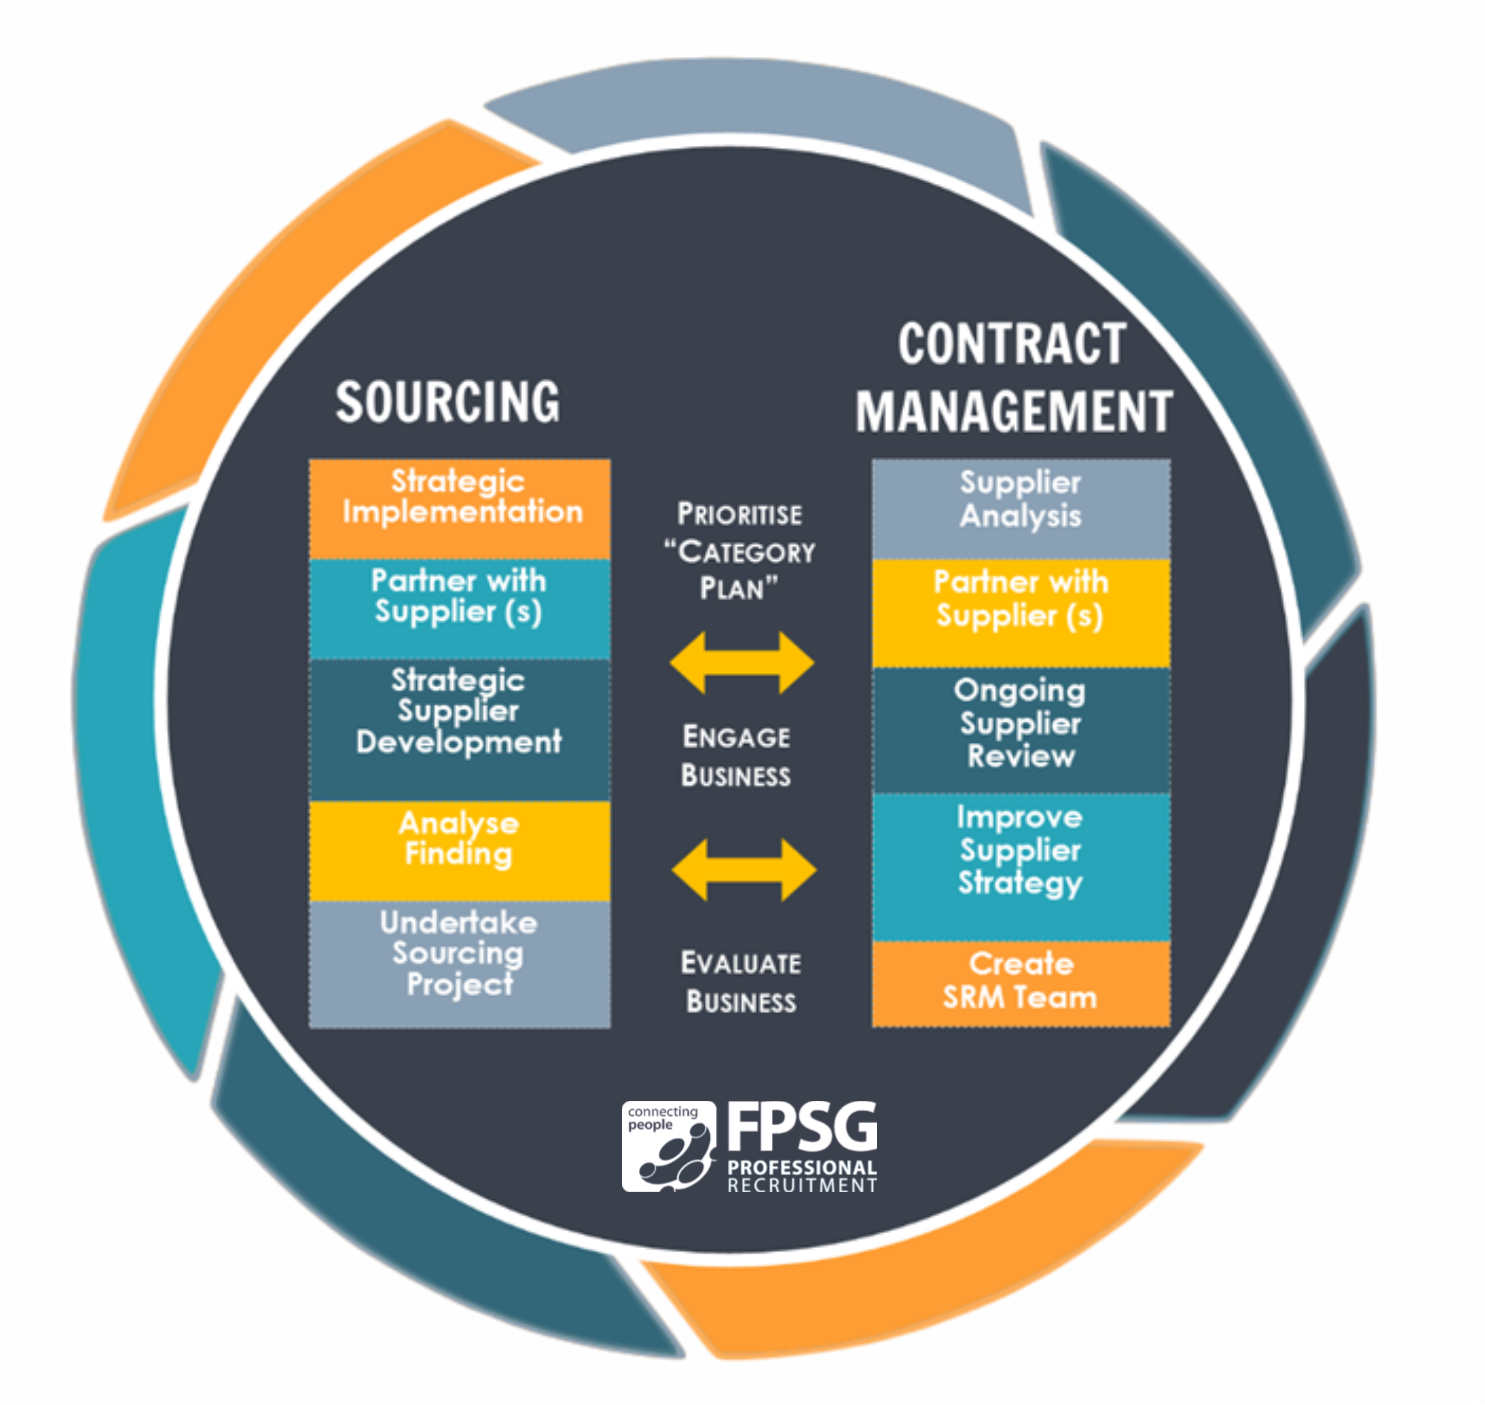 Procurement Sourcing Model - FPSG Specialist Recruitment | Glasgow